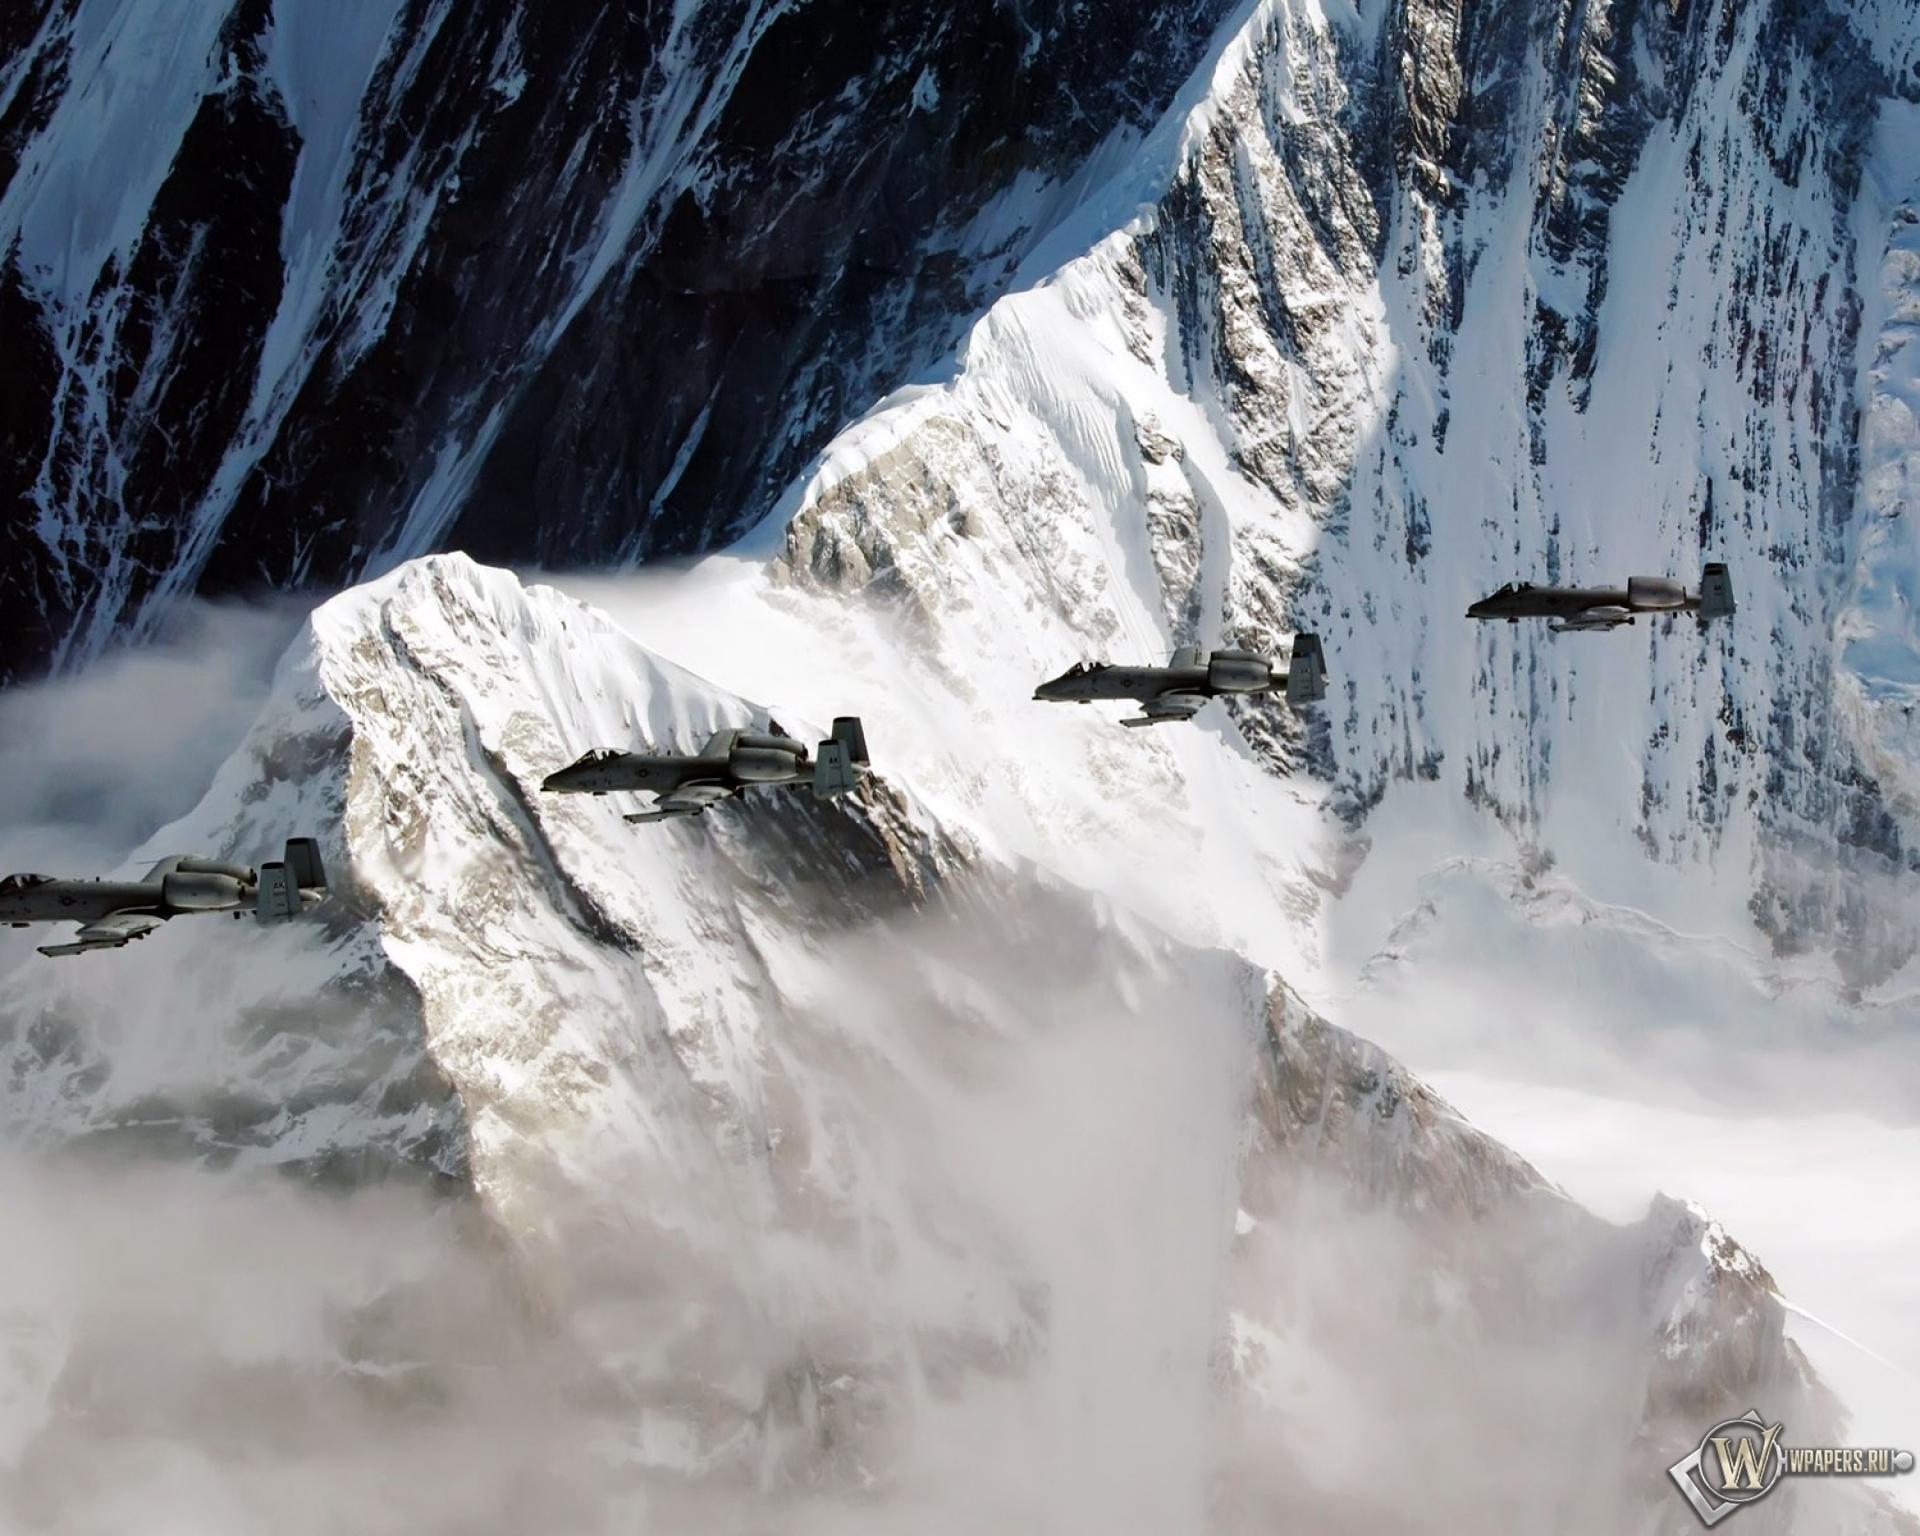 Alaska Range, Ruth Amphitheater, Alaska  № 1442171 бесплатно